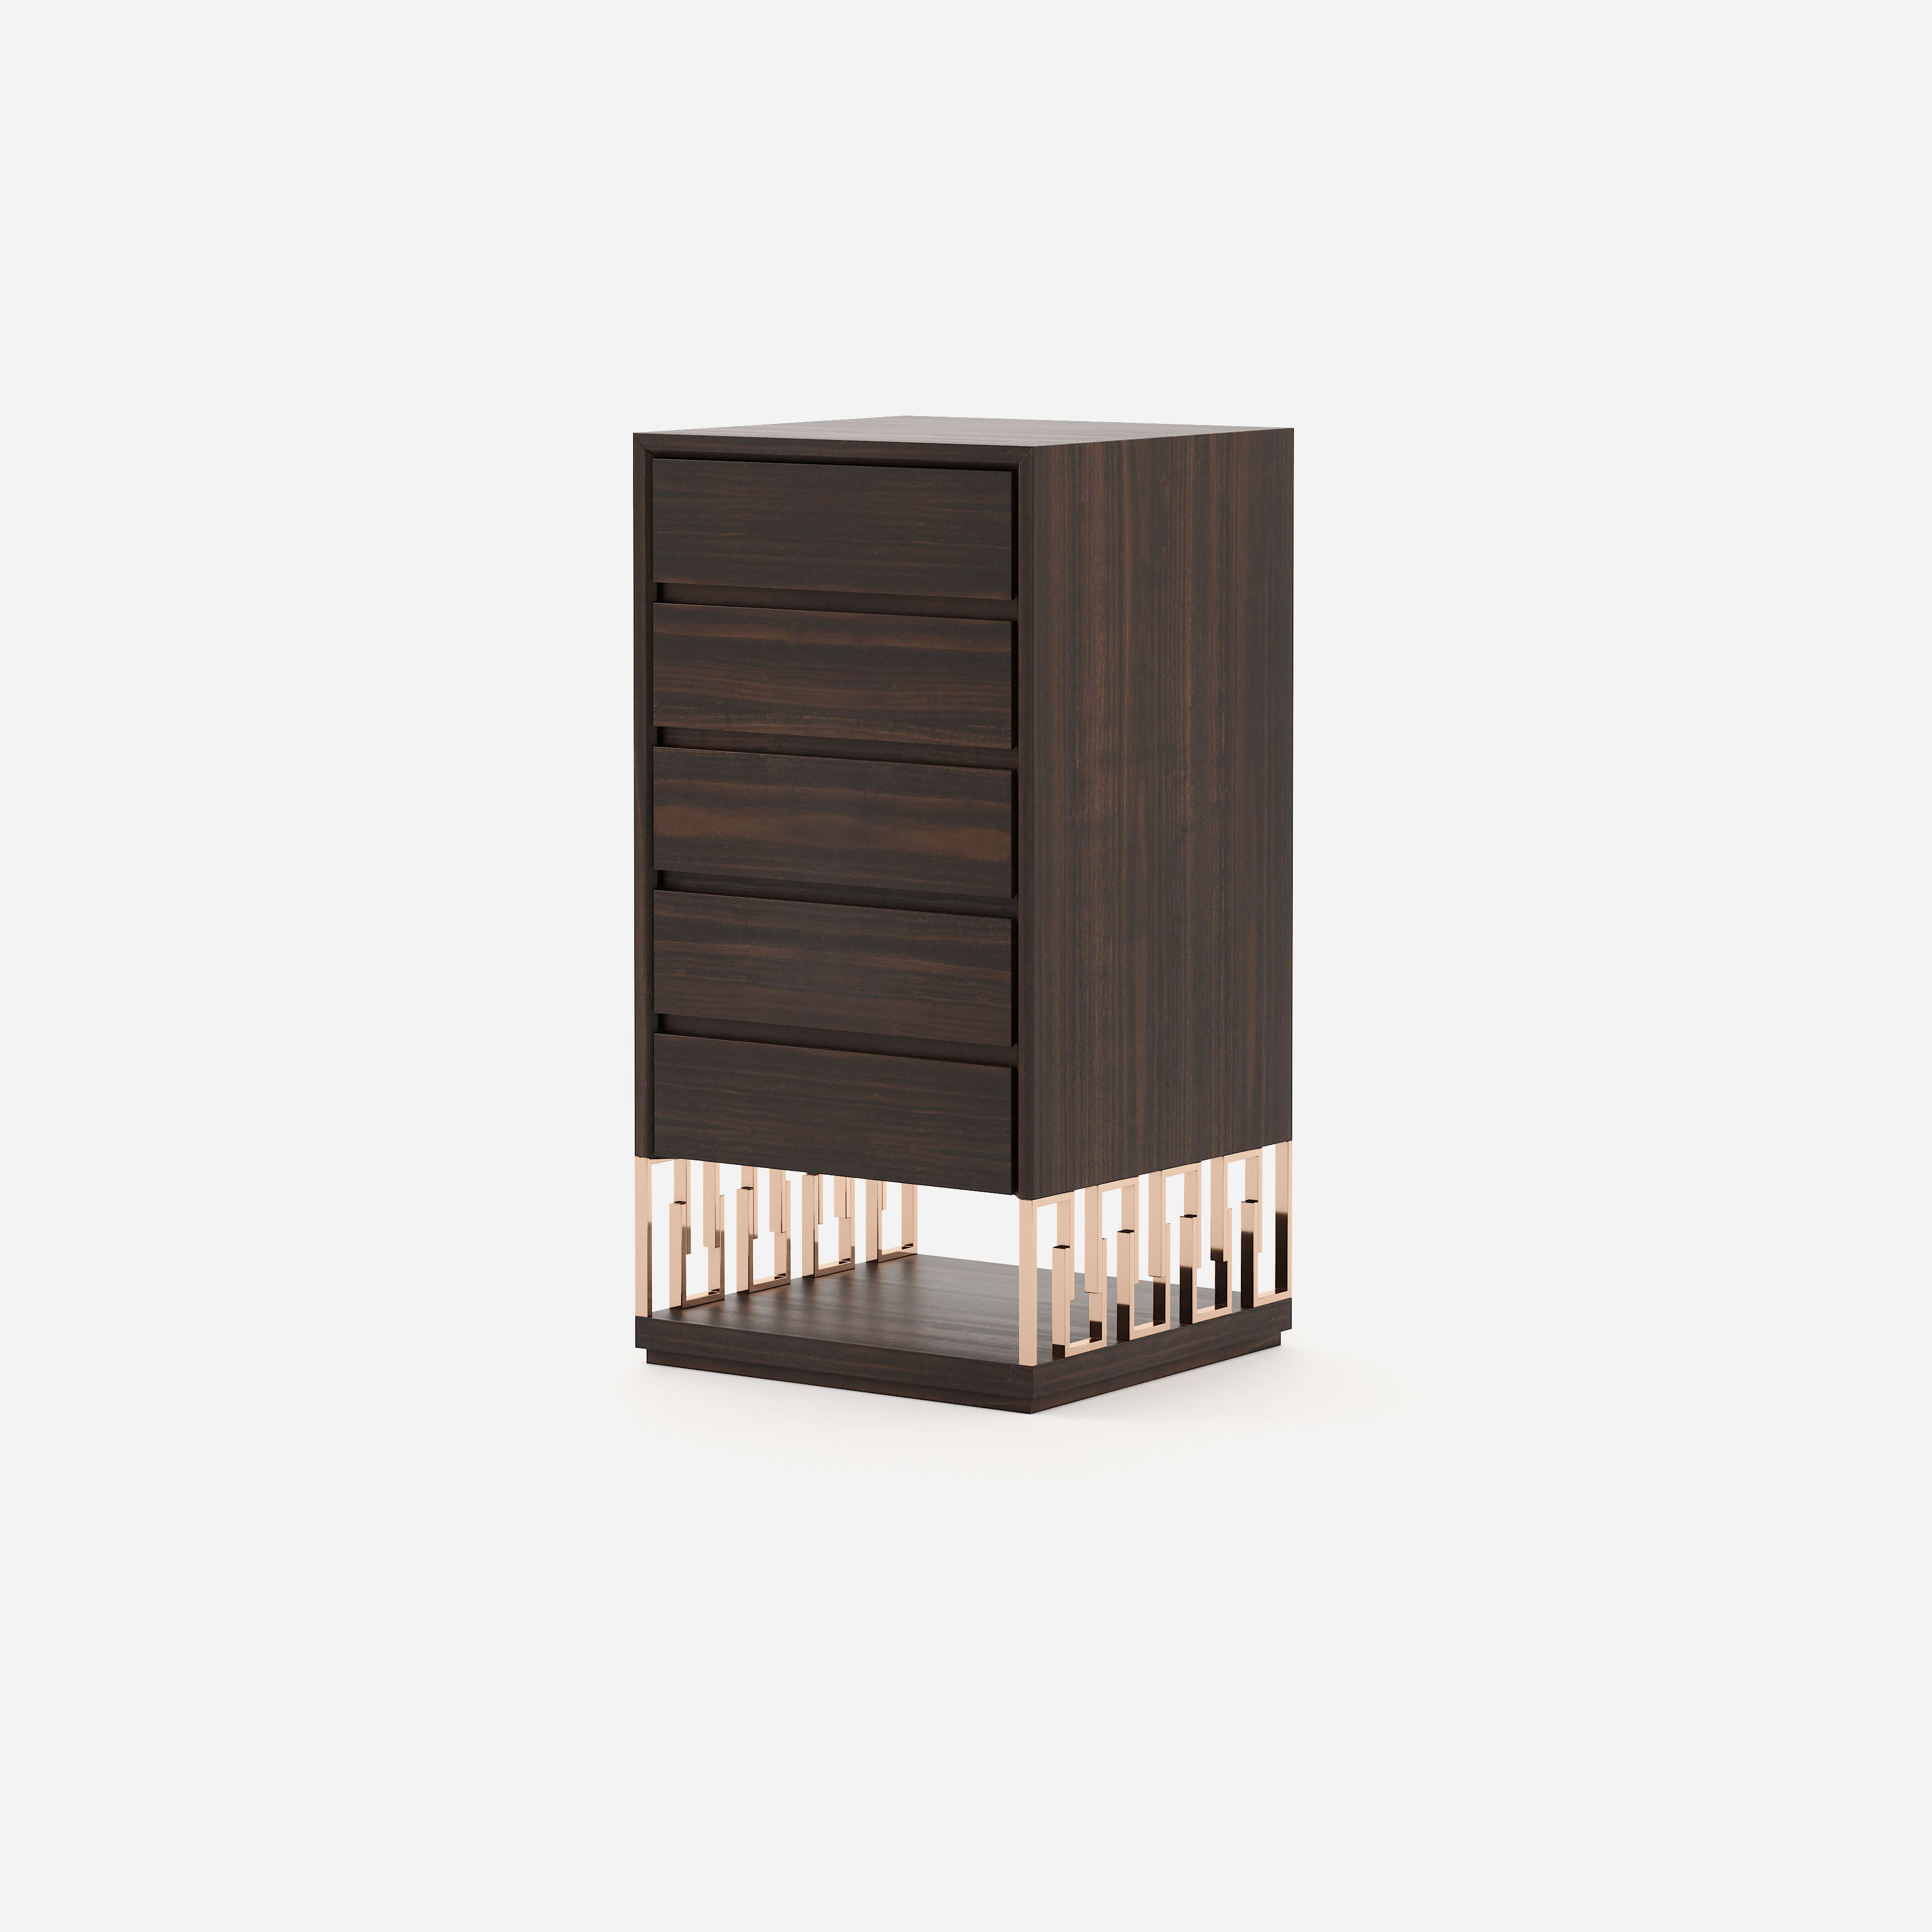 paola-dresser-storage-master-bedroom-classic-elegant-wooden-domkapa-1